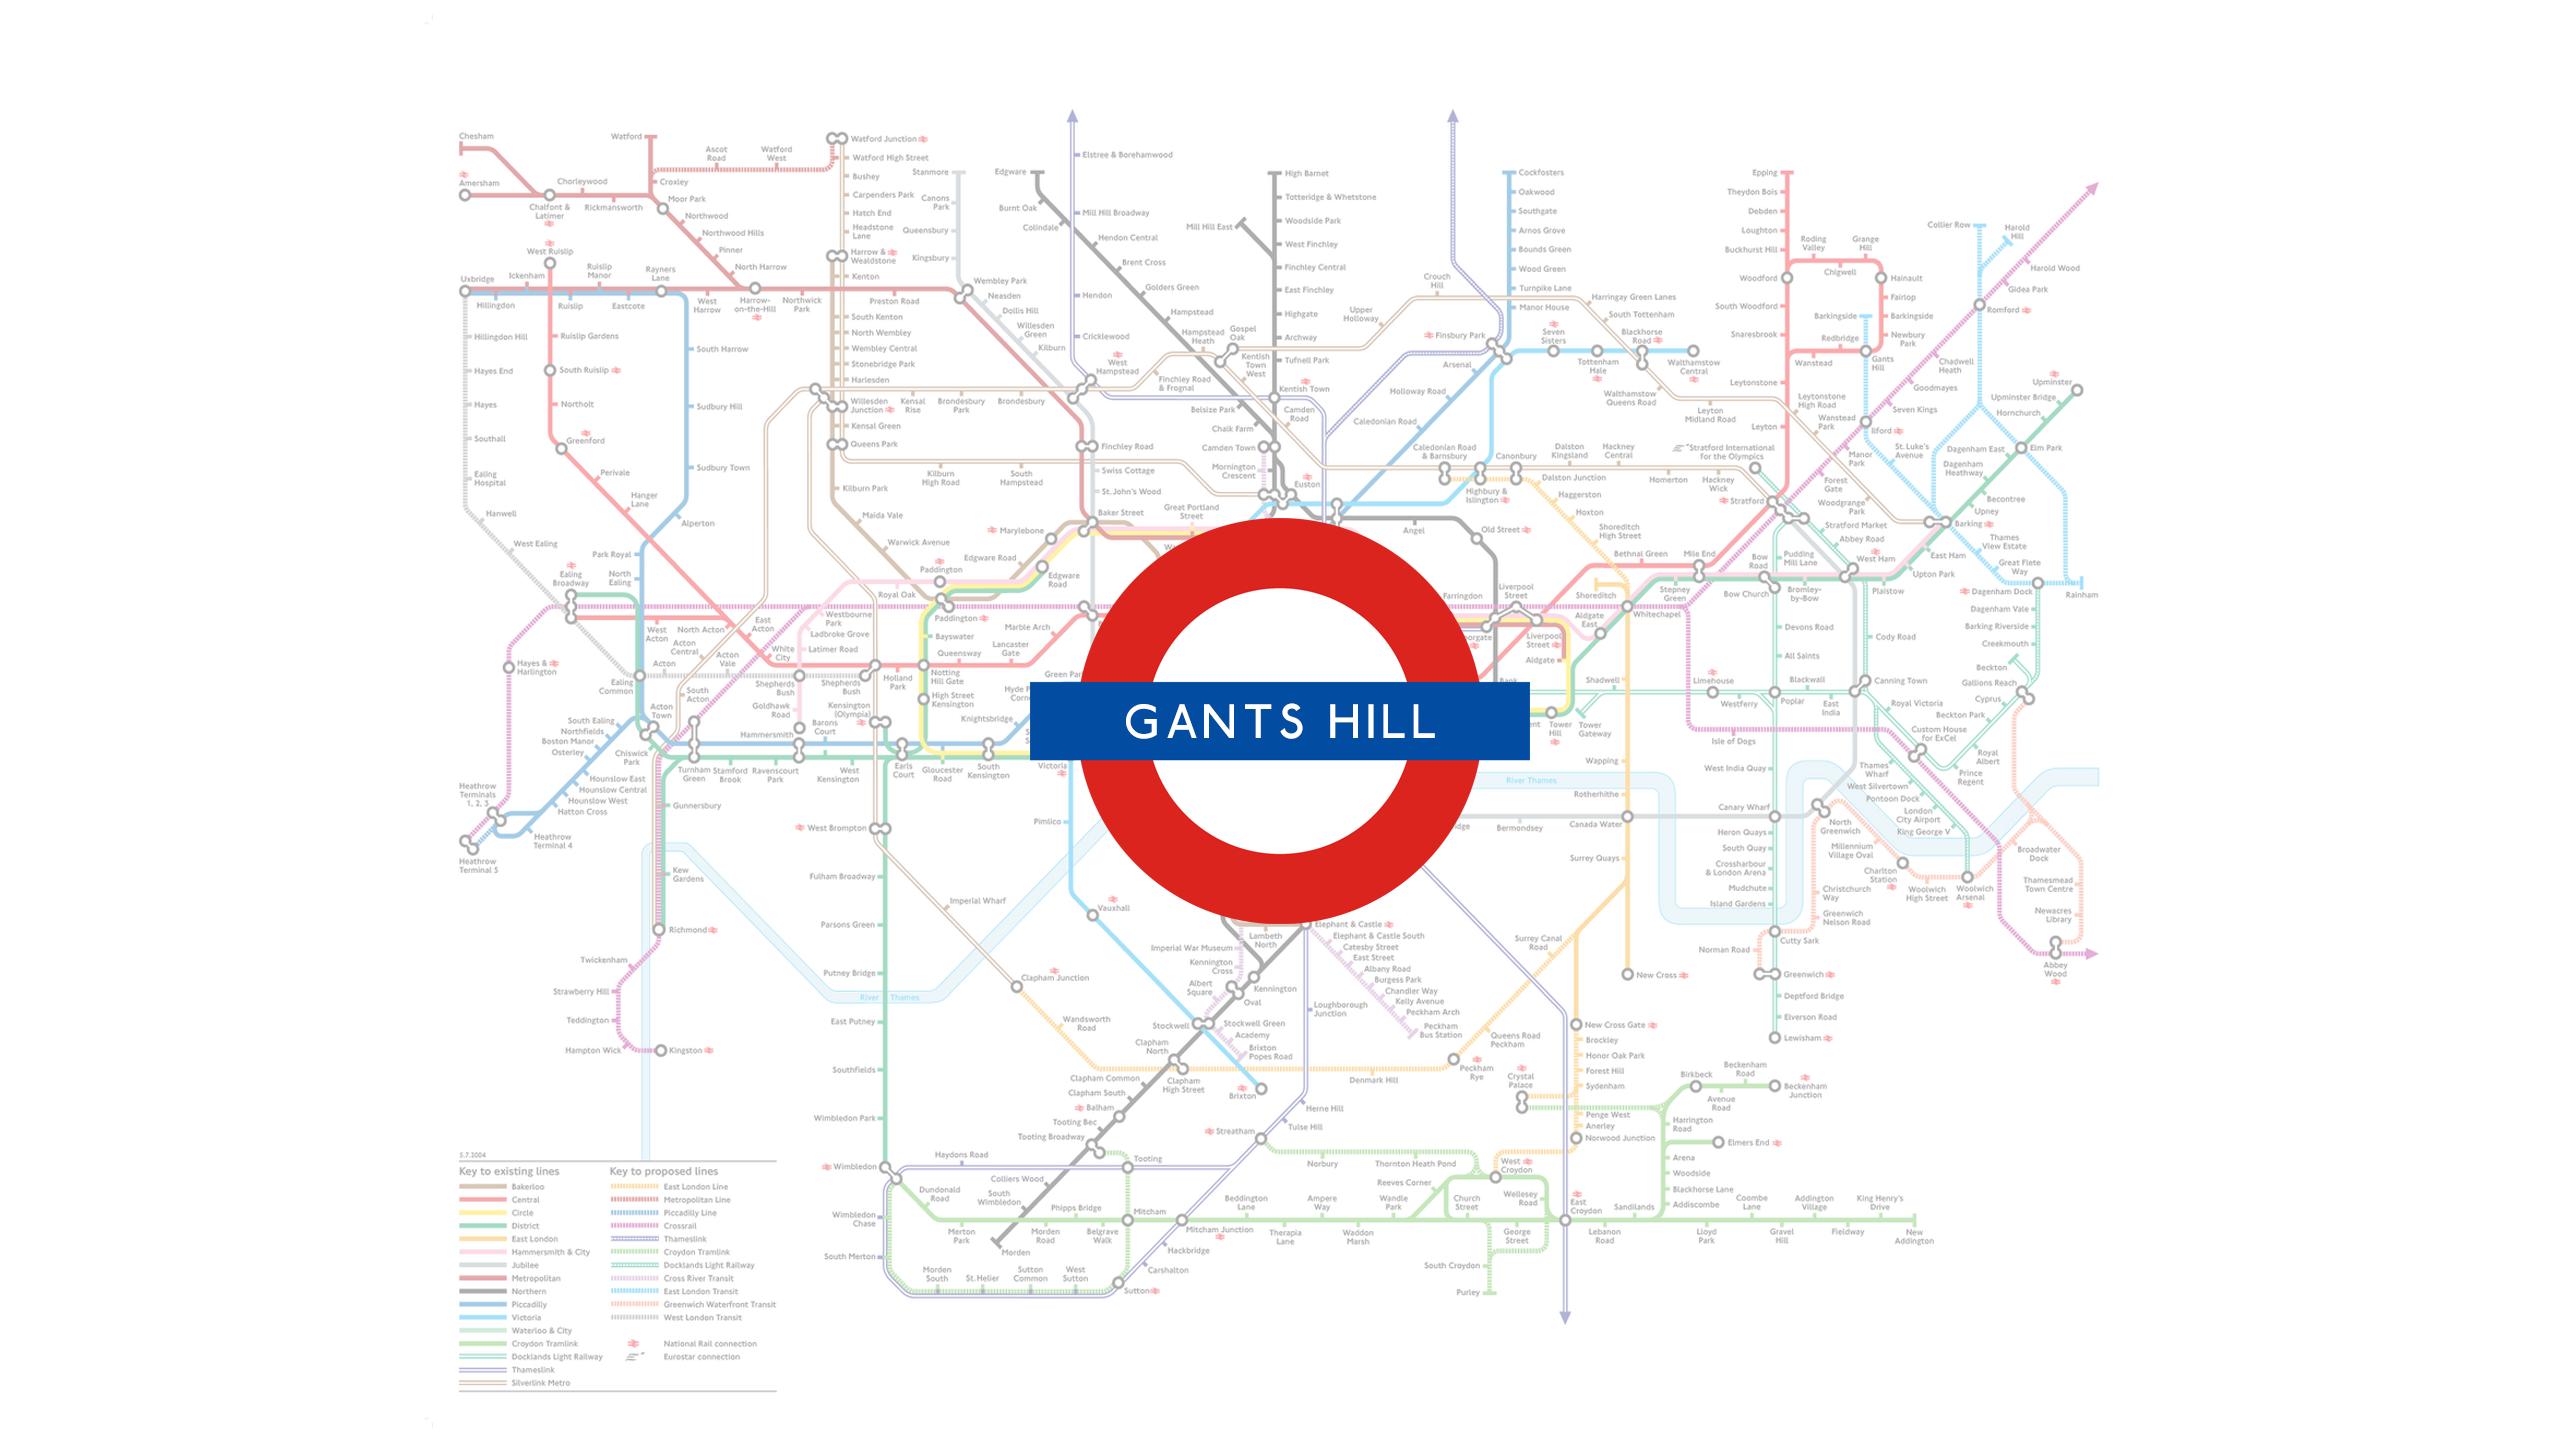 Gants Hill (Map)